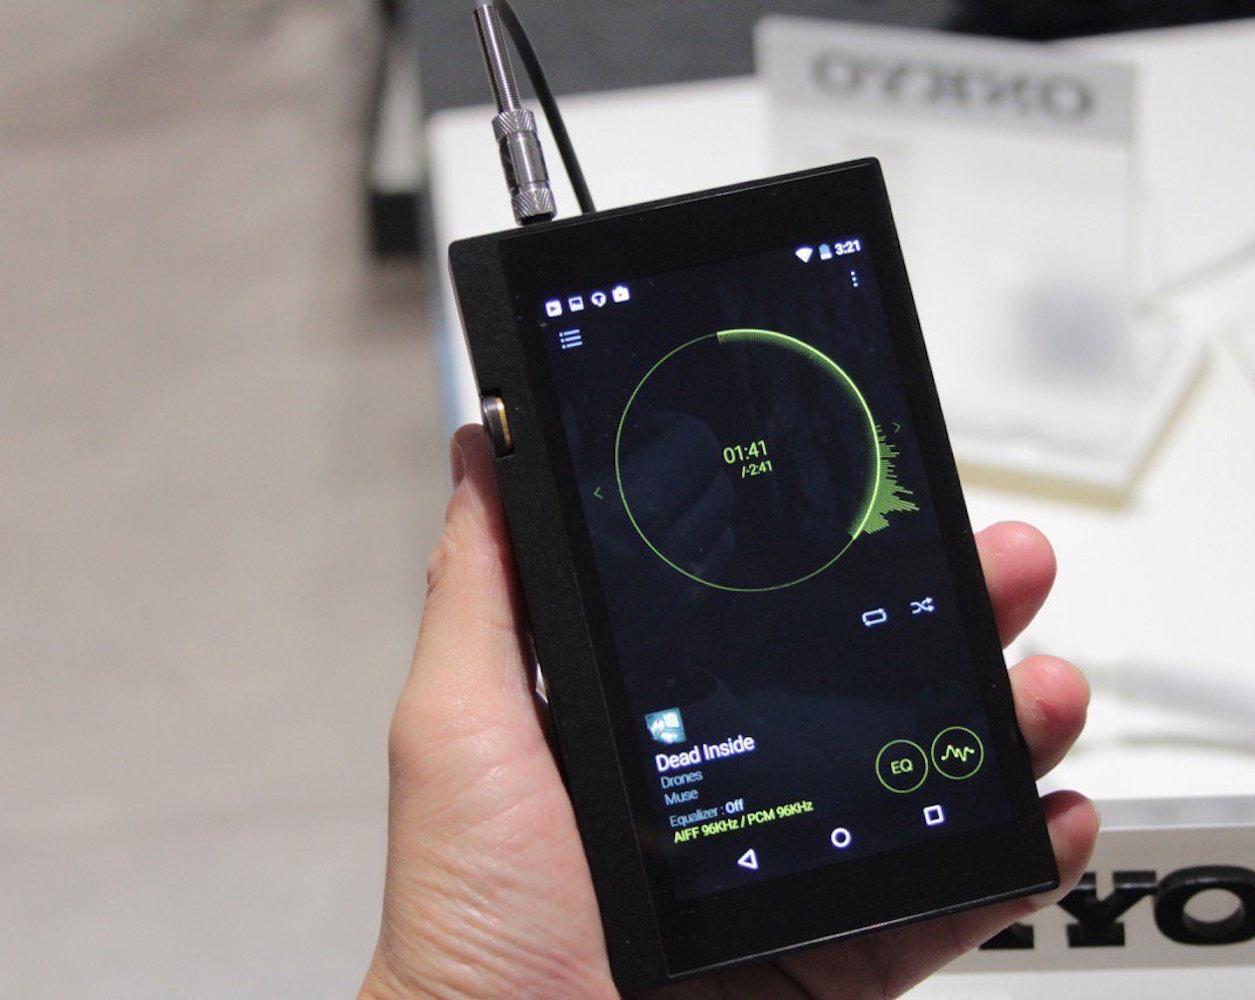 Onkyo DP-X1 Digital Audio Player